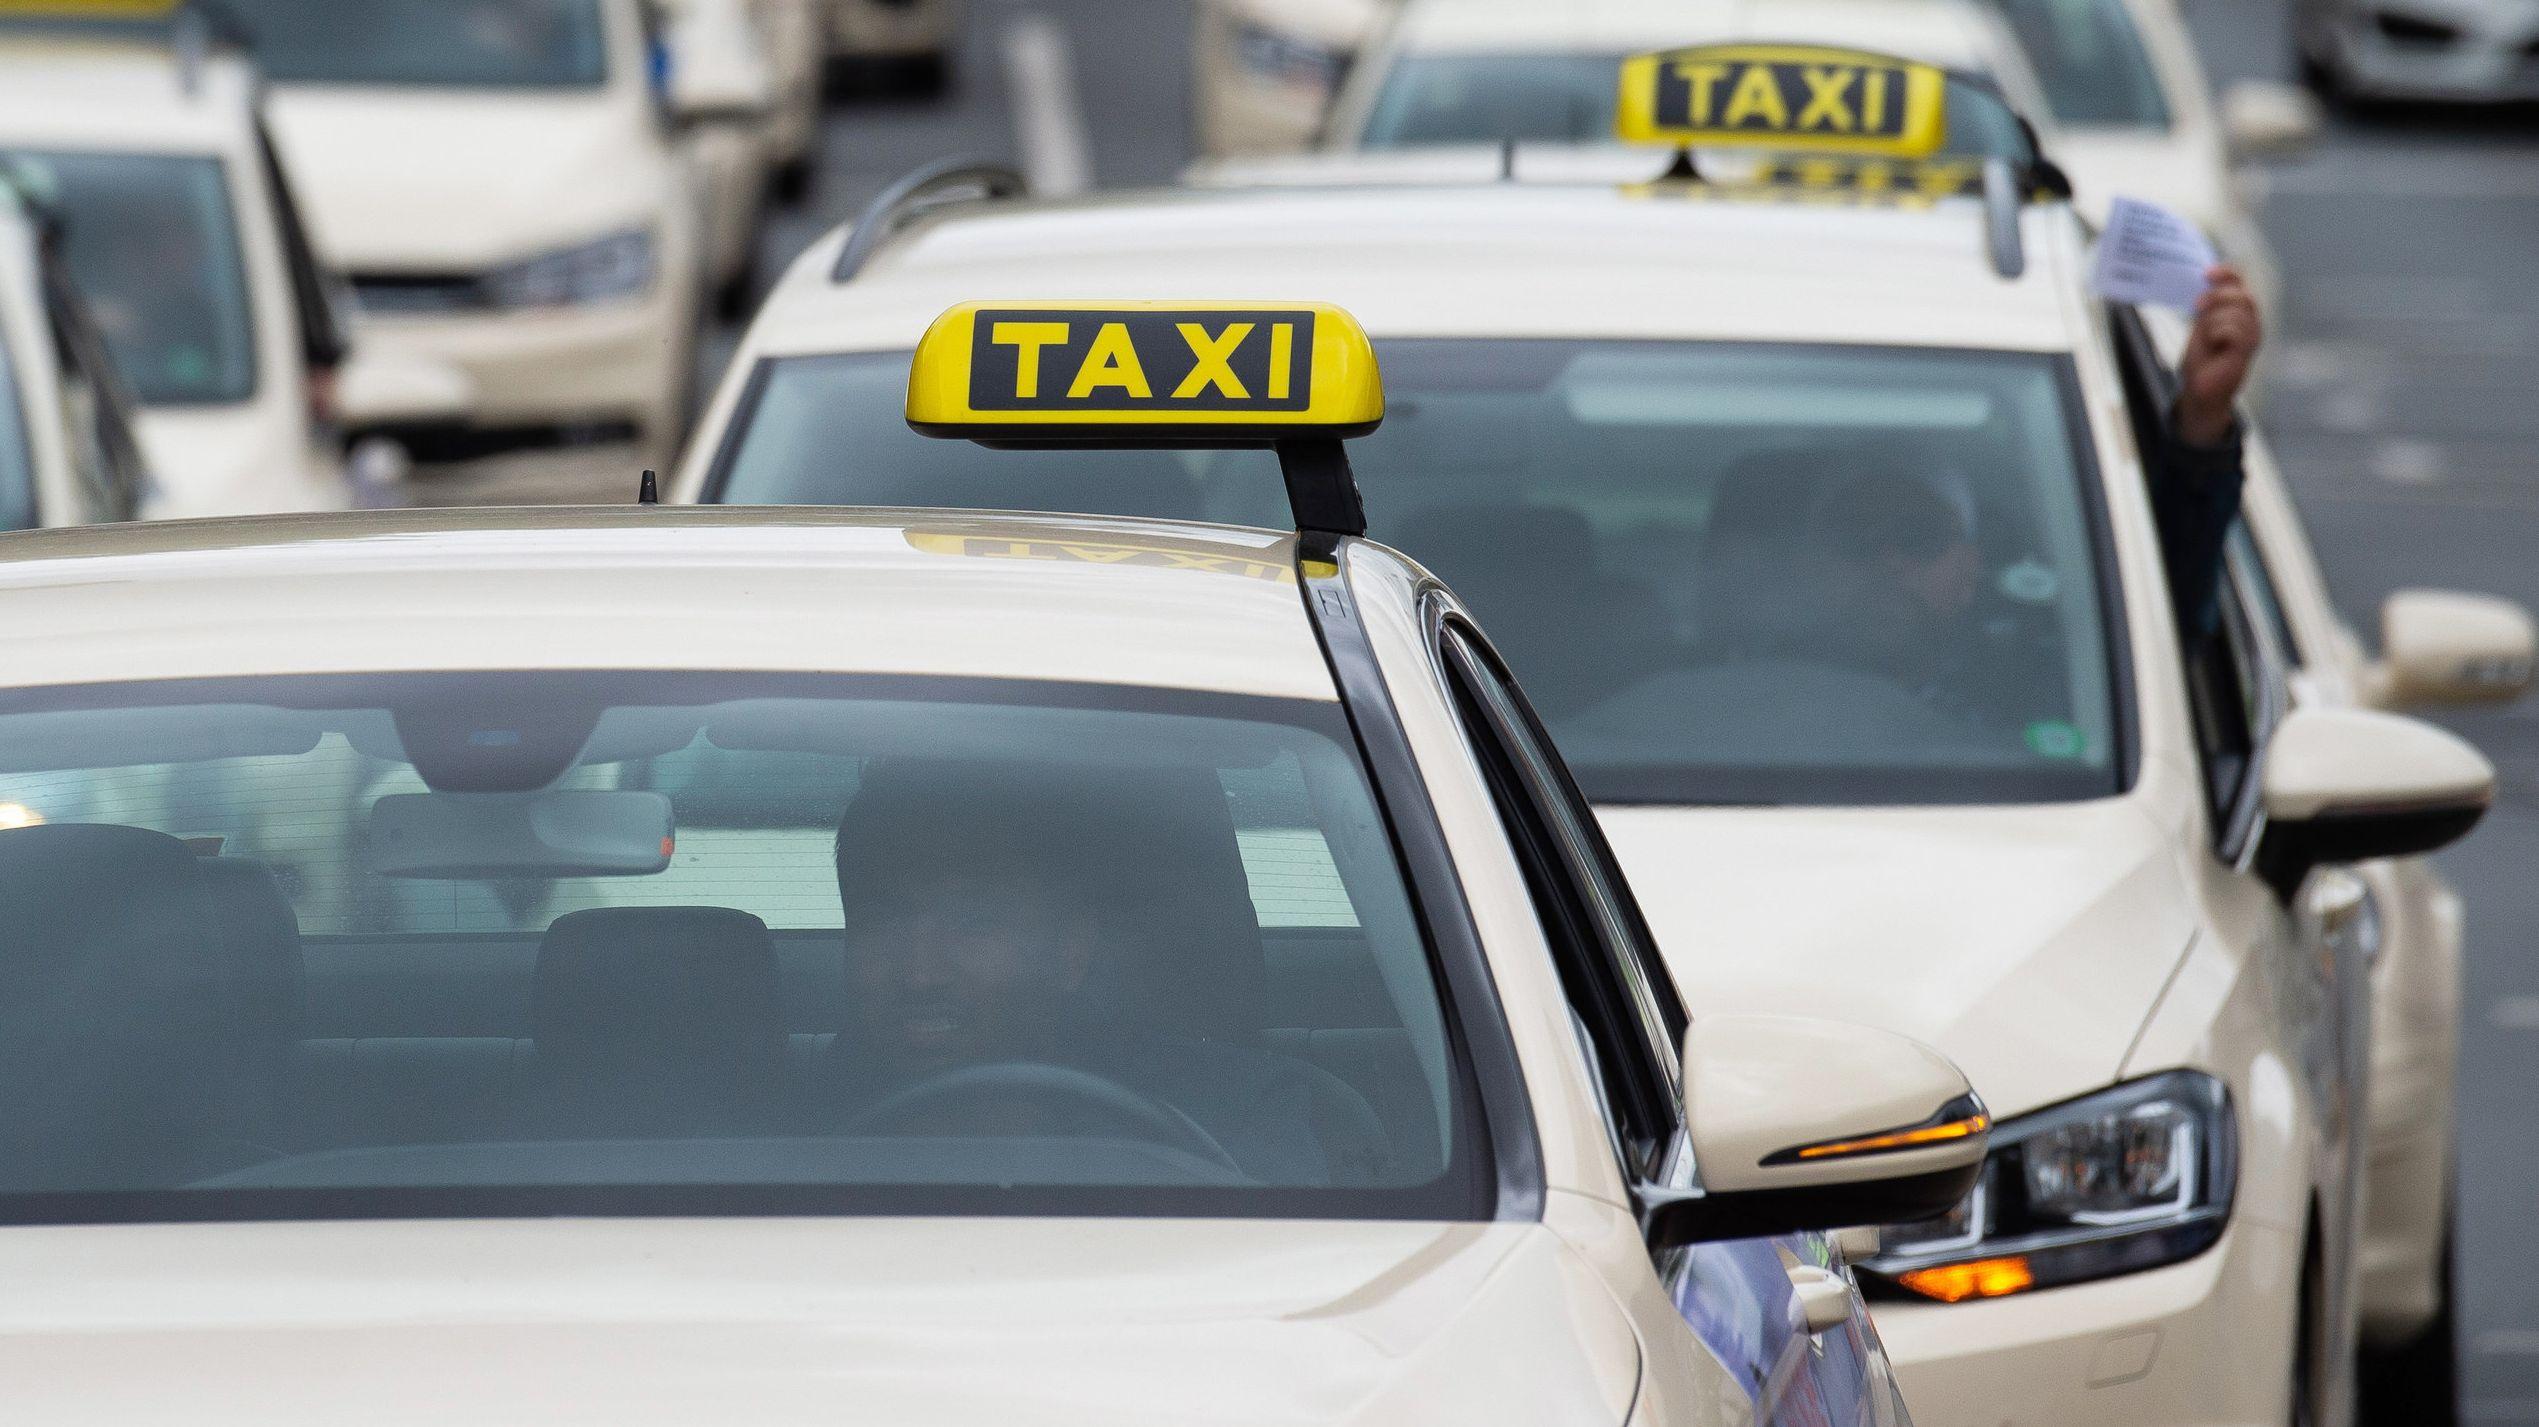 Taxifahren in Regensburg soll teurer werden (Symbolbild)